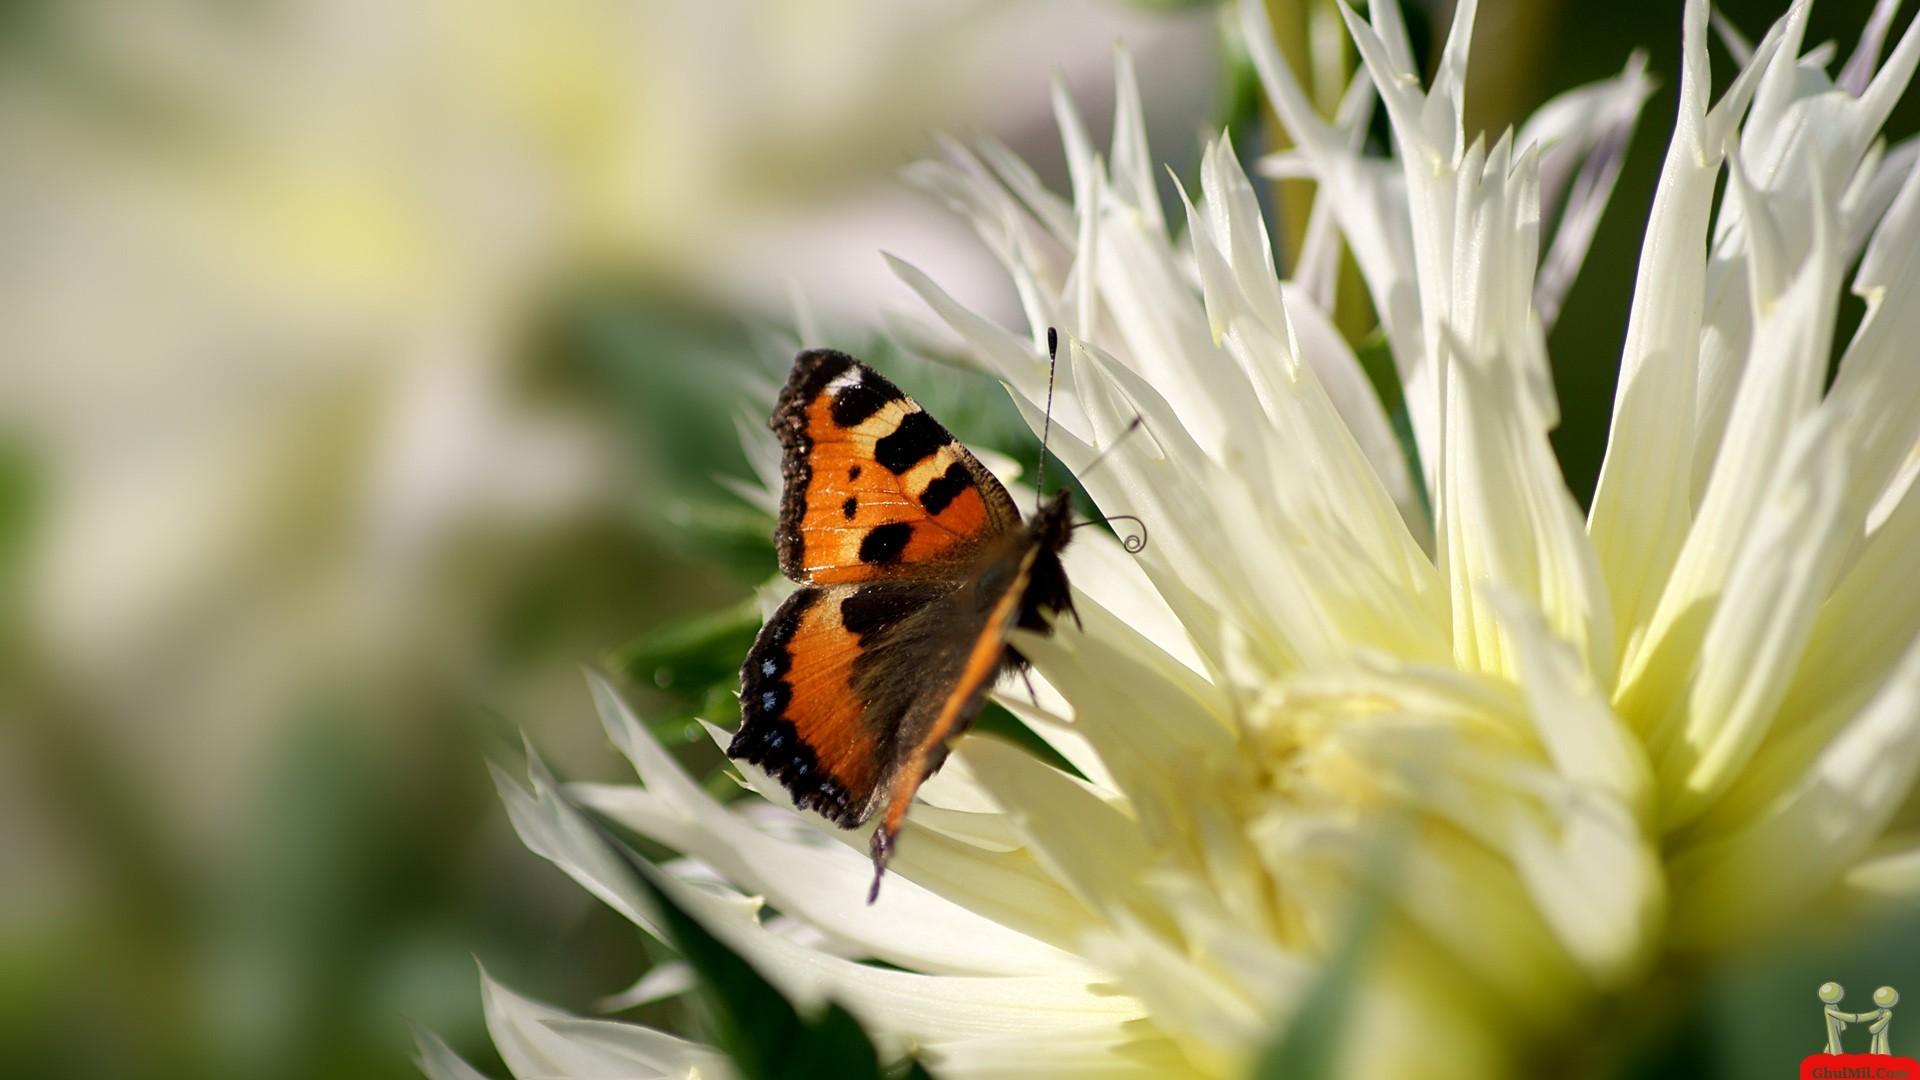 Beautiful Butterflies and Flowers Wallpapers – WallpaperSafari